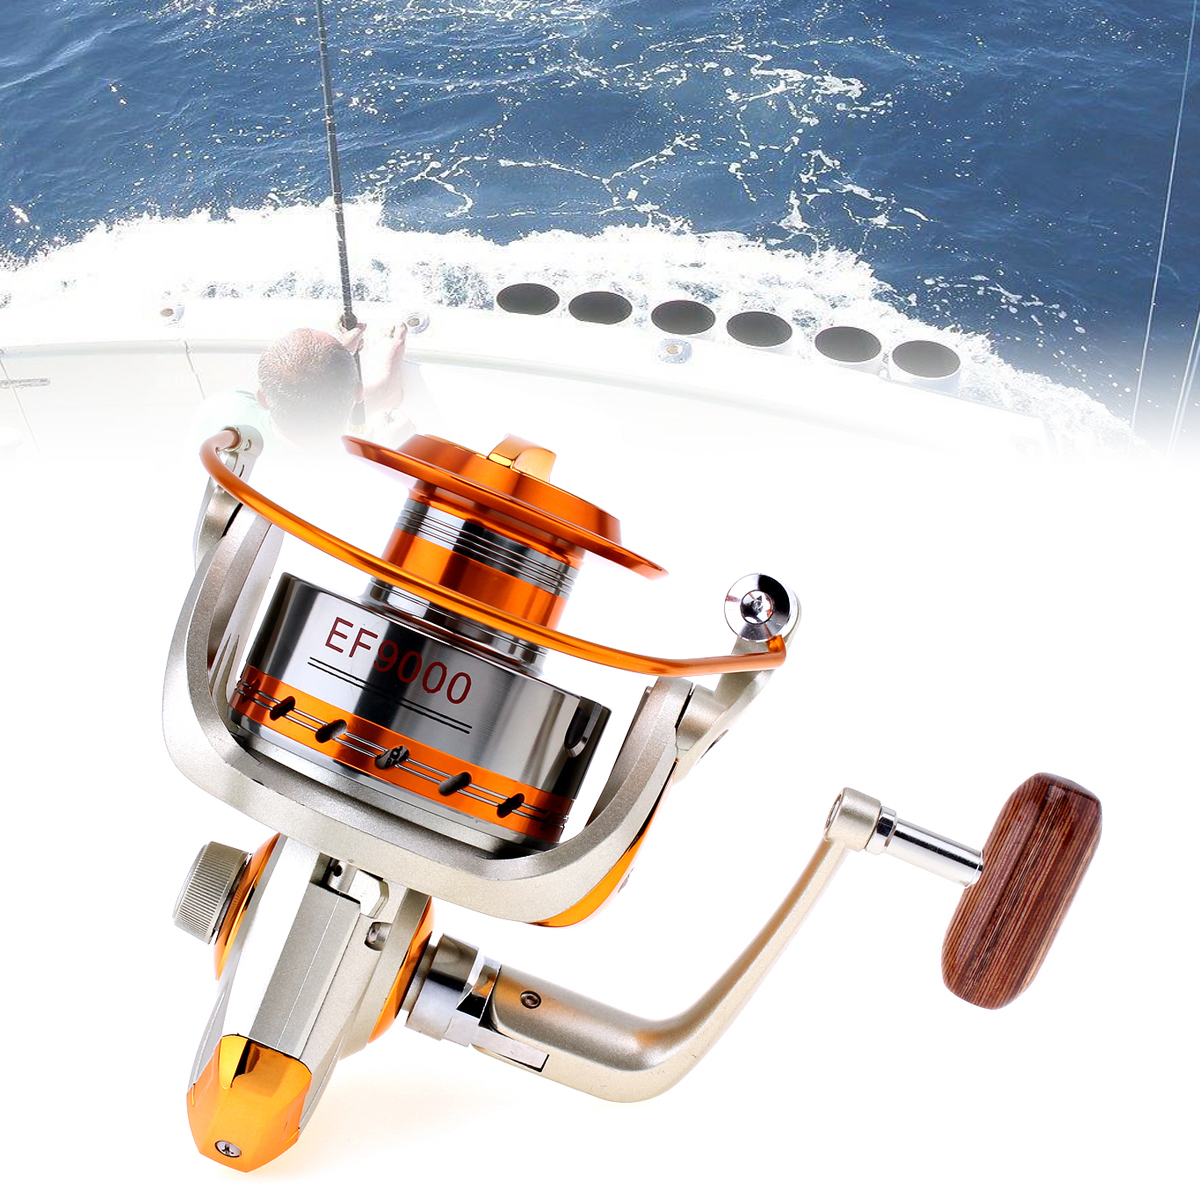 Yumoshi 9000 Series 12BB 4.7:1 Gear Ratio Trolling Long Shot Casting Big Sea Spinning Fishing Reel